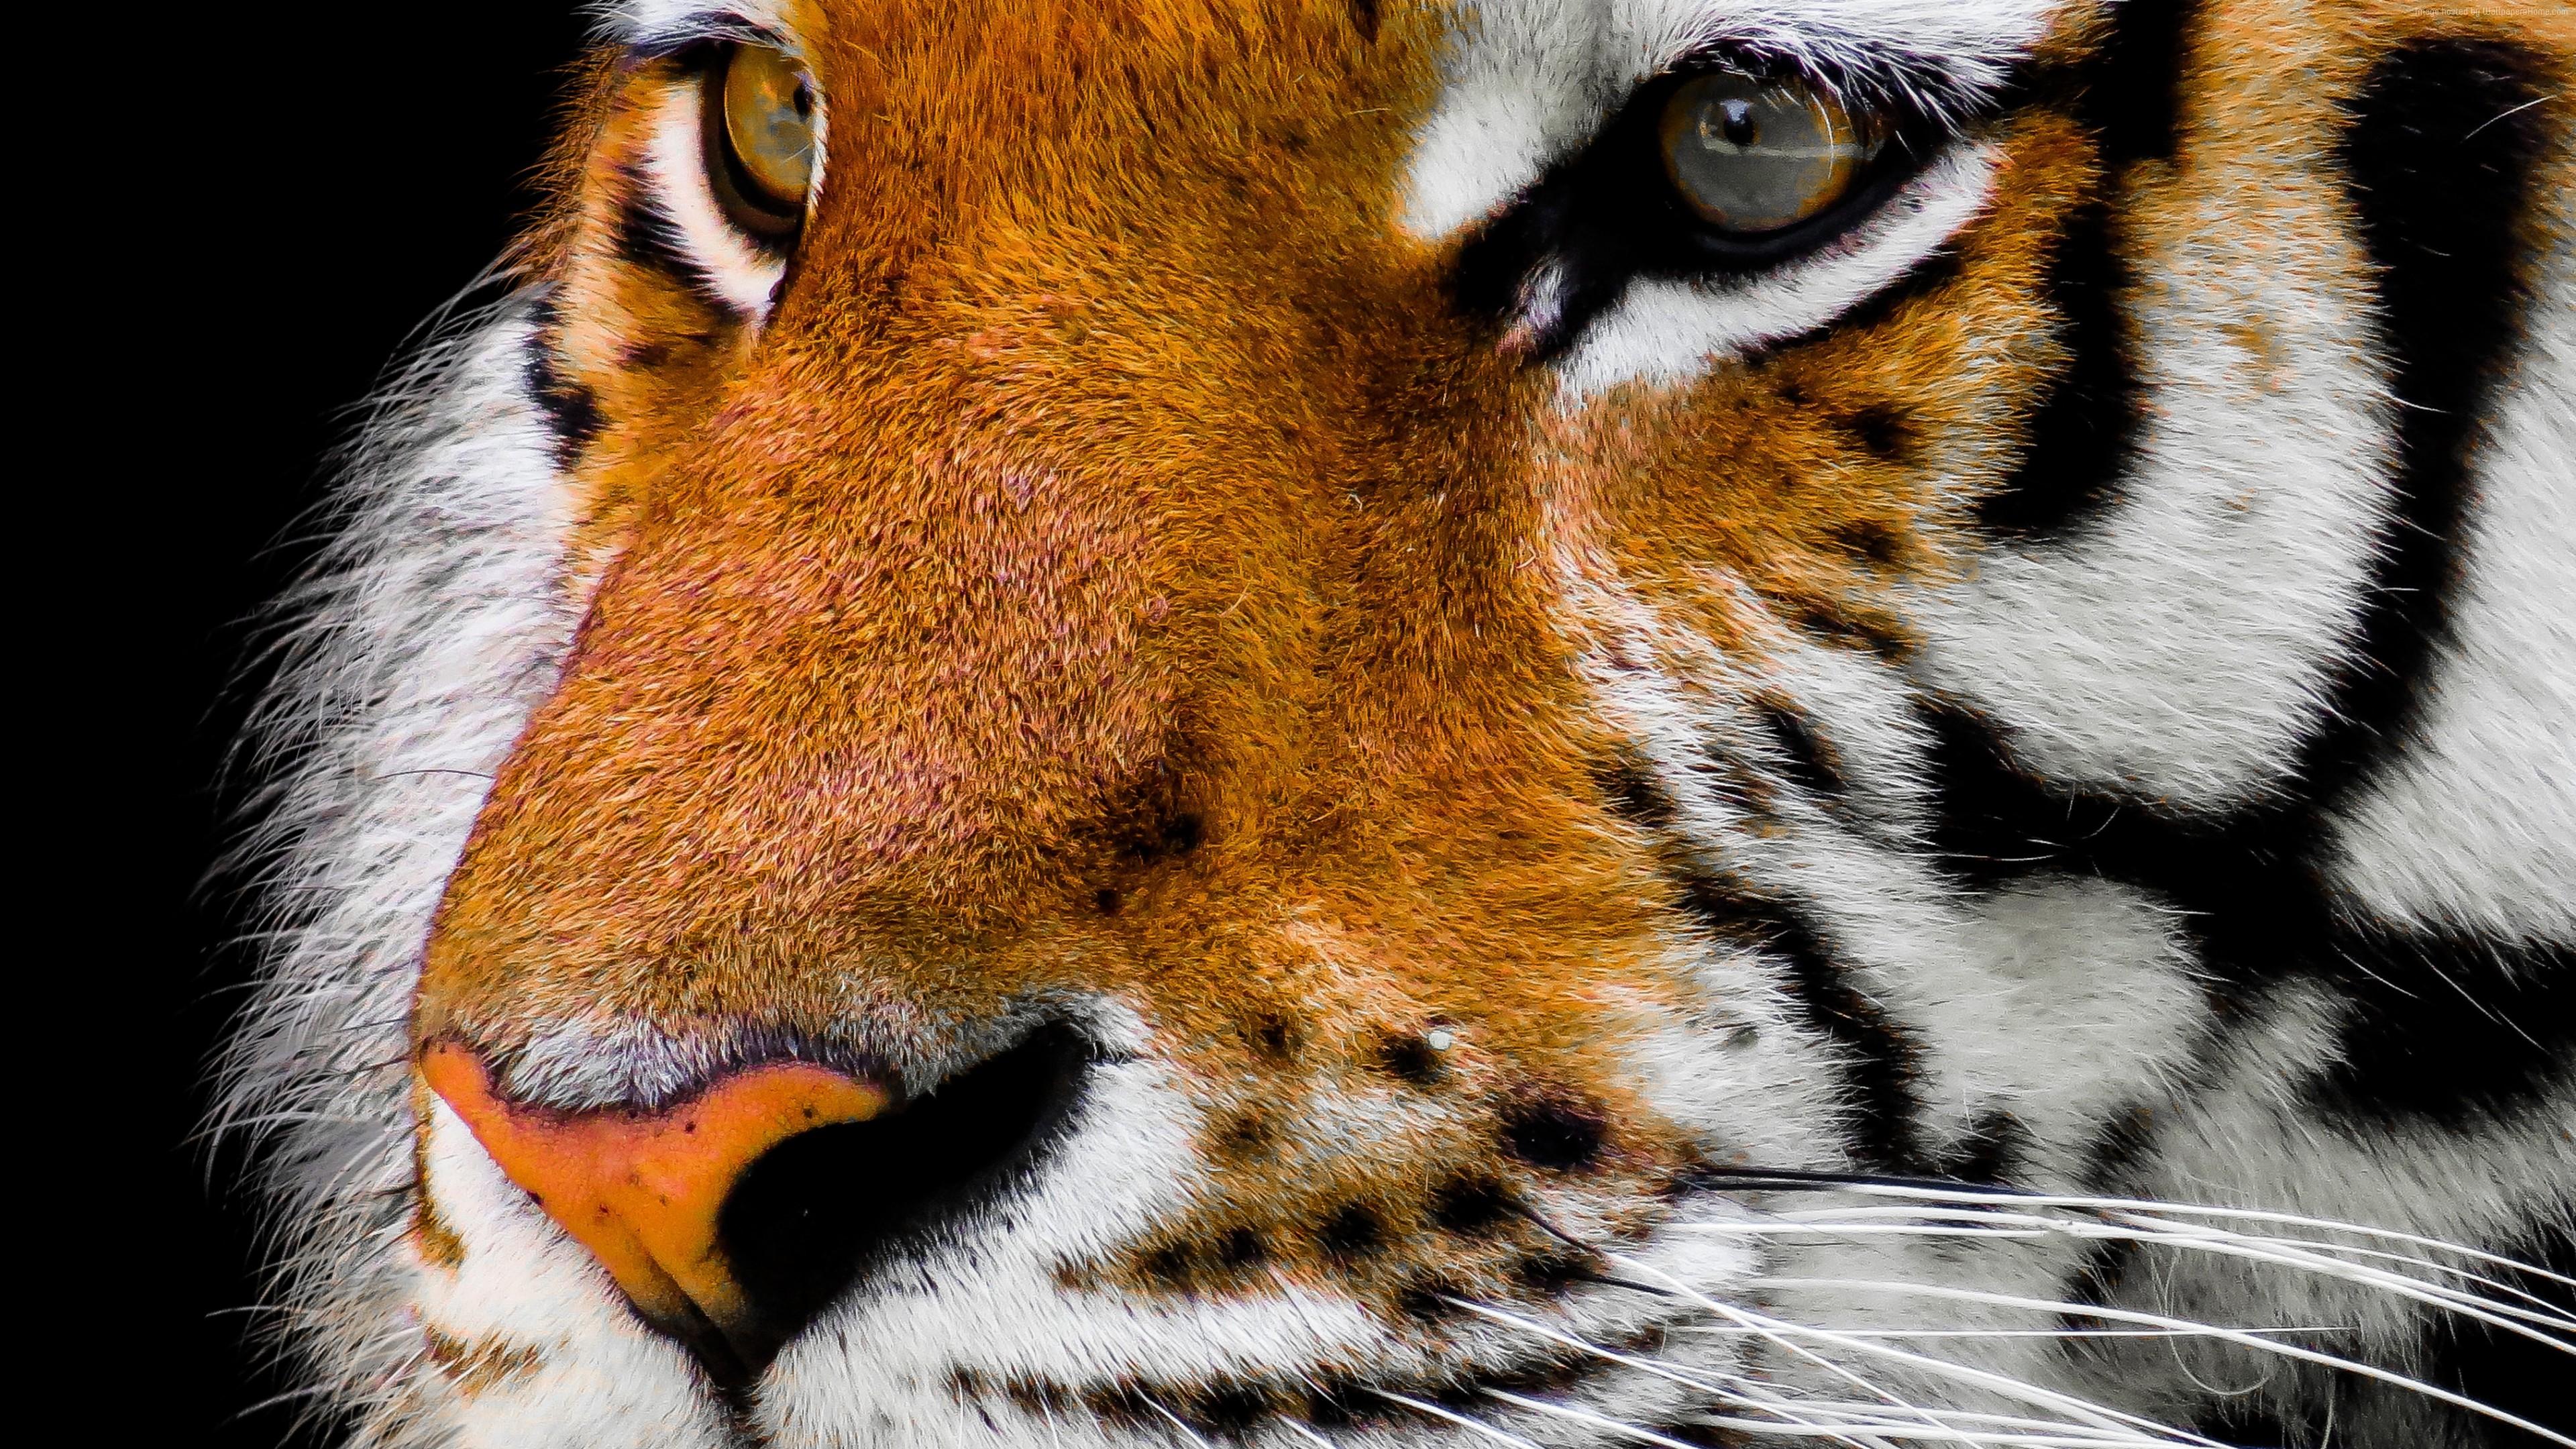 Wallpaper Tiger Cute Animals 4k Download